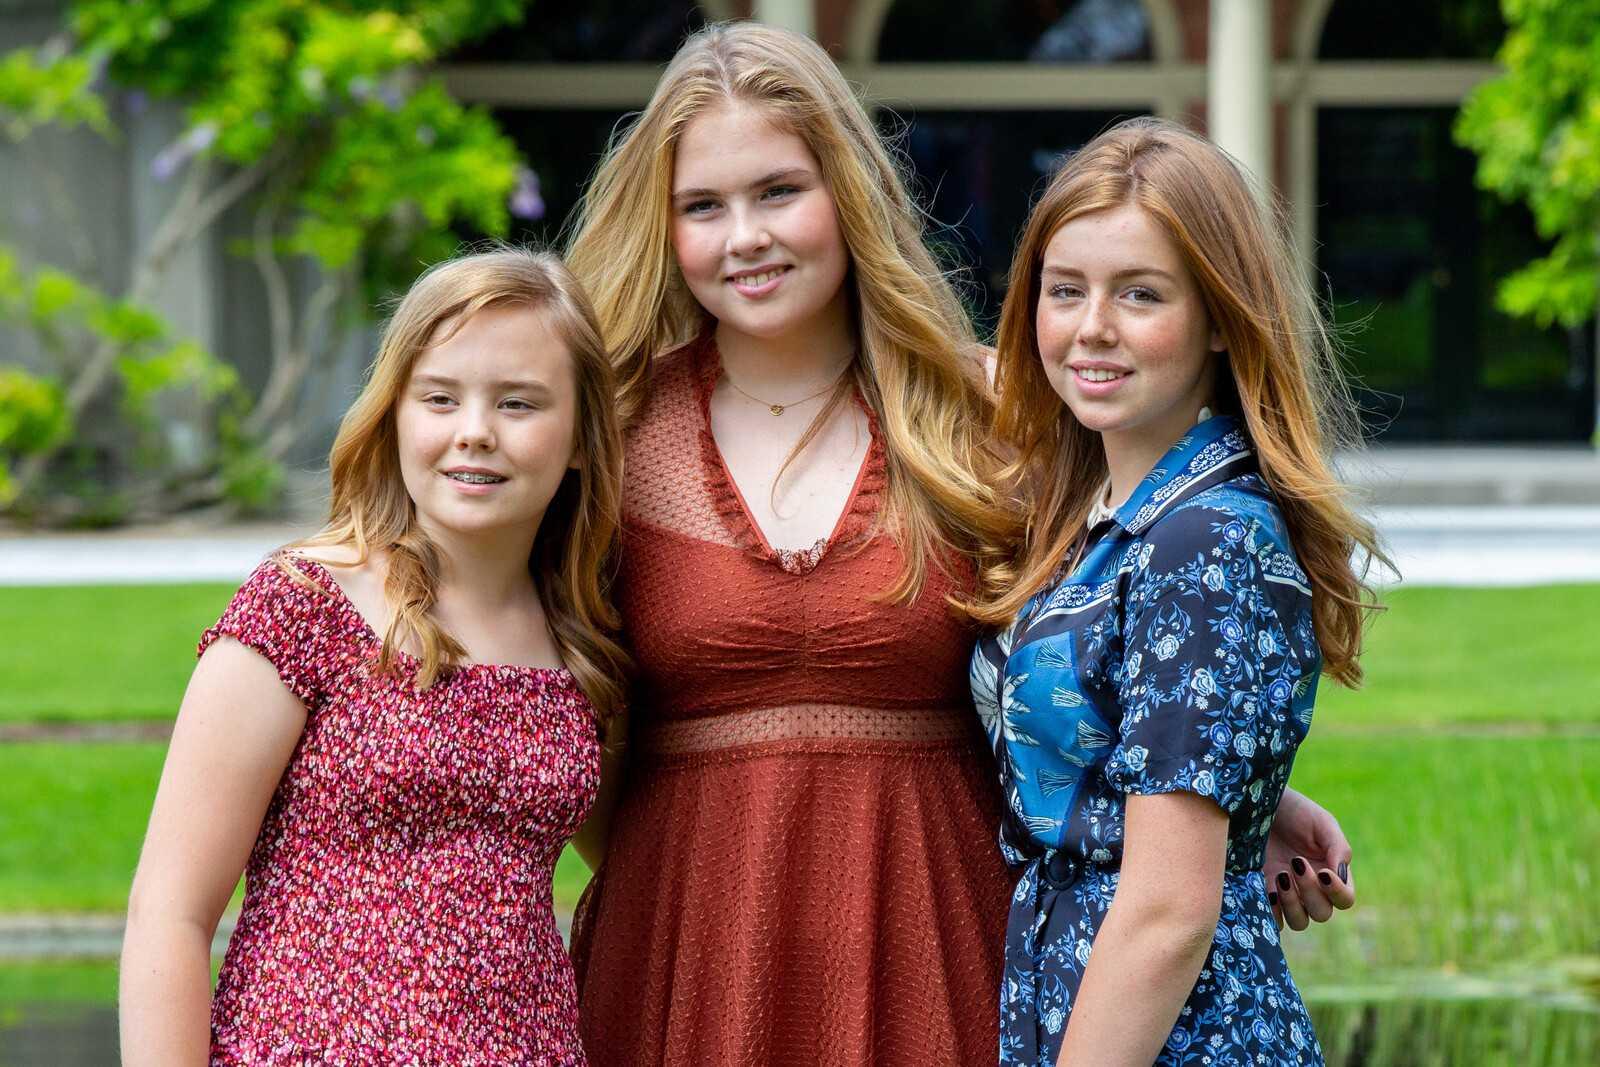 Слева направо: принцессы Ариане, Амалия, Алексия. Фото: ©RVD/Wesley de Wit.